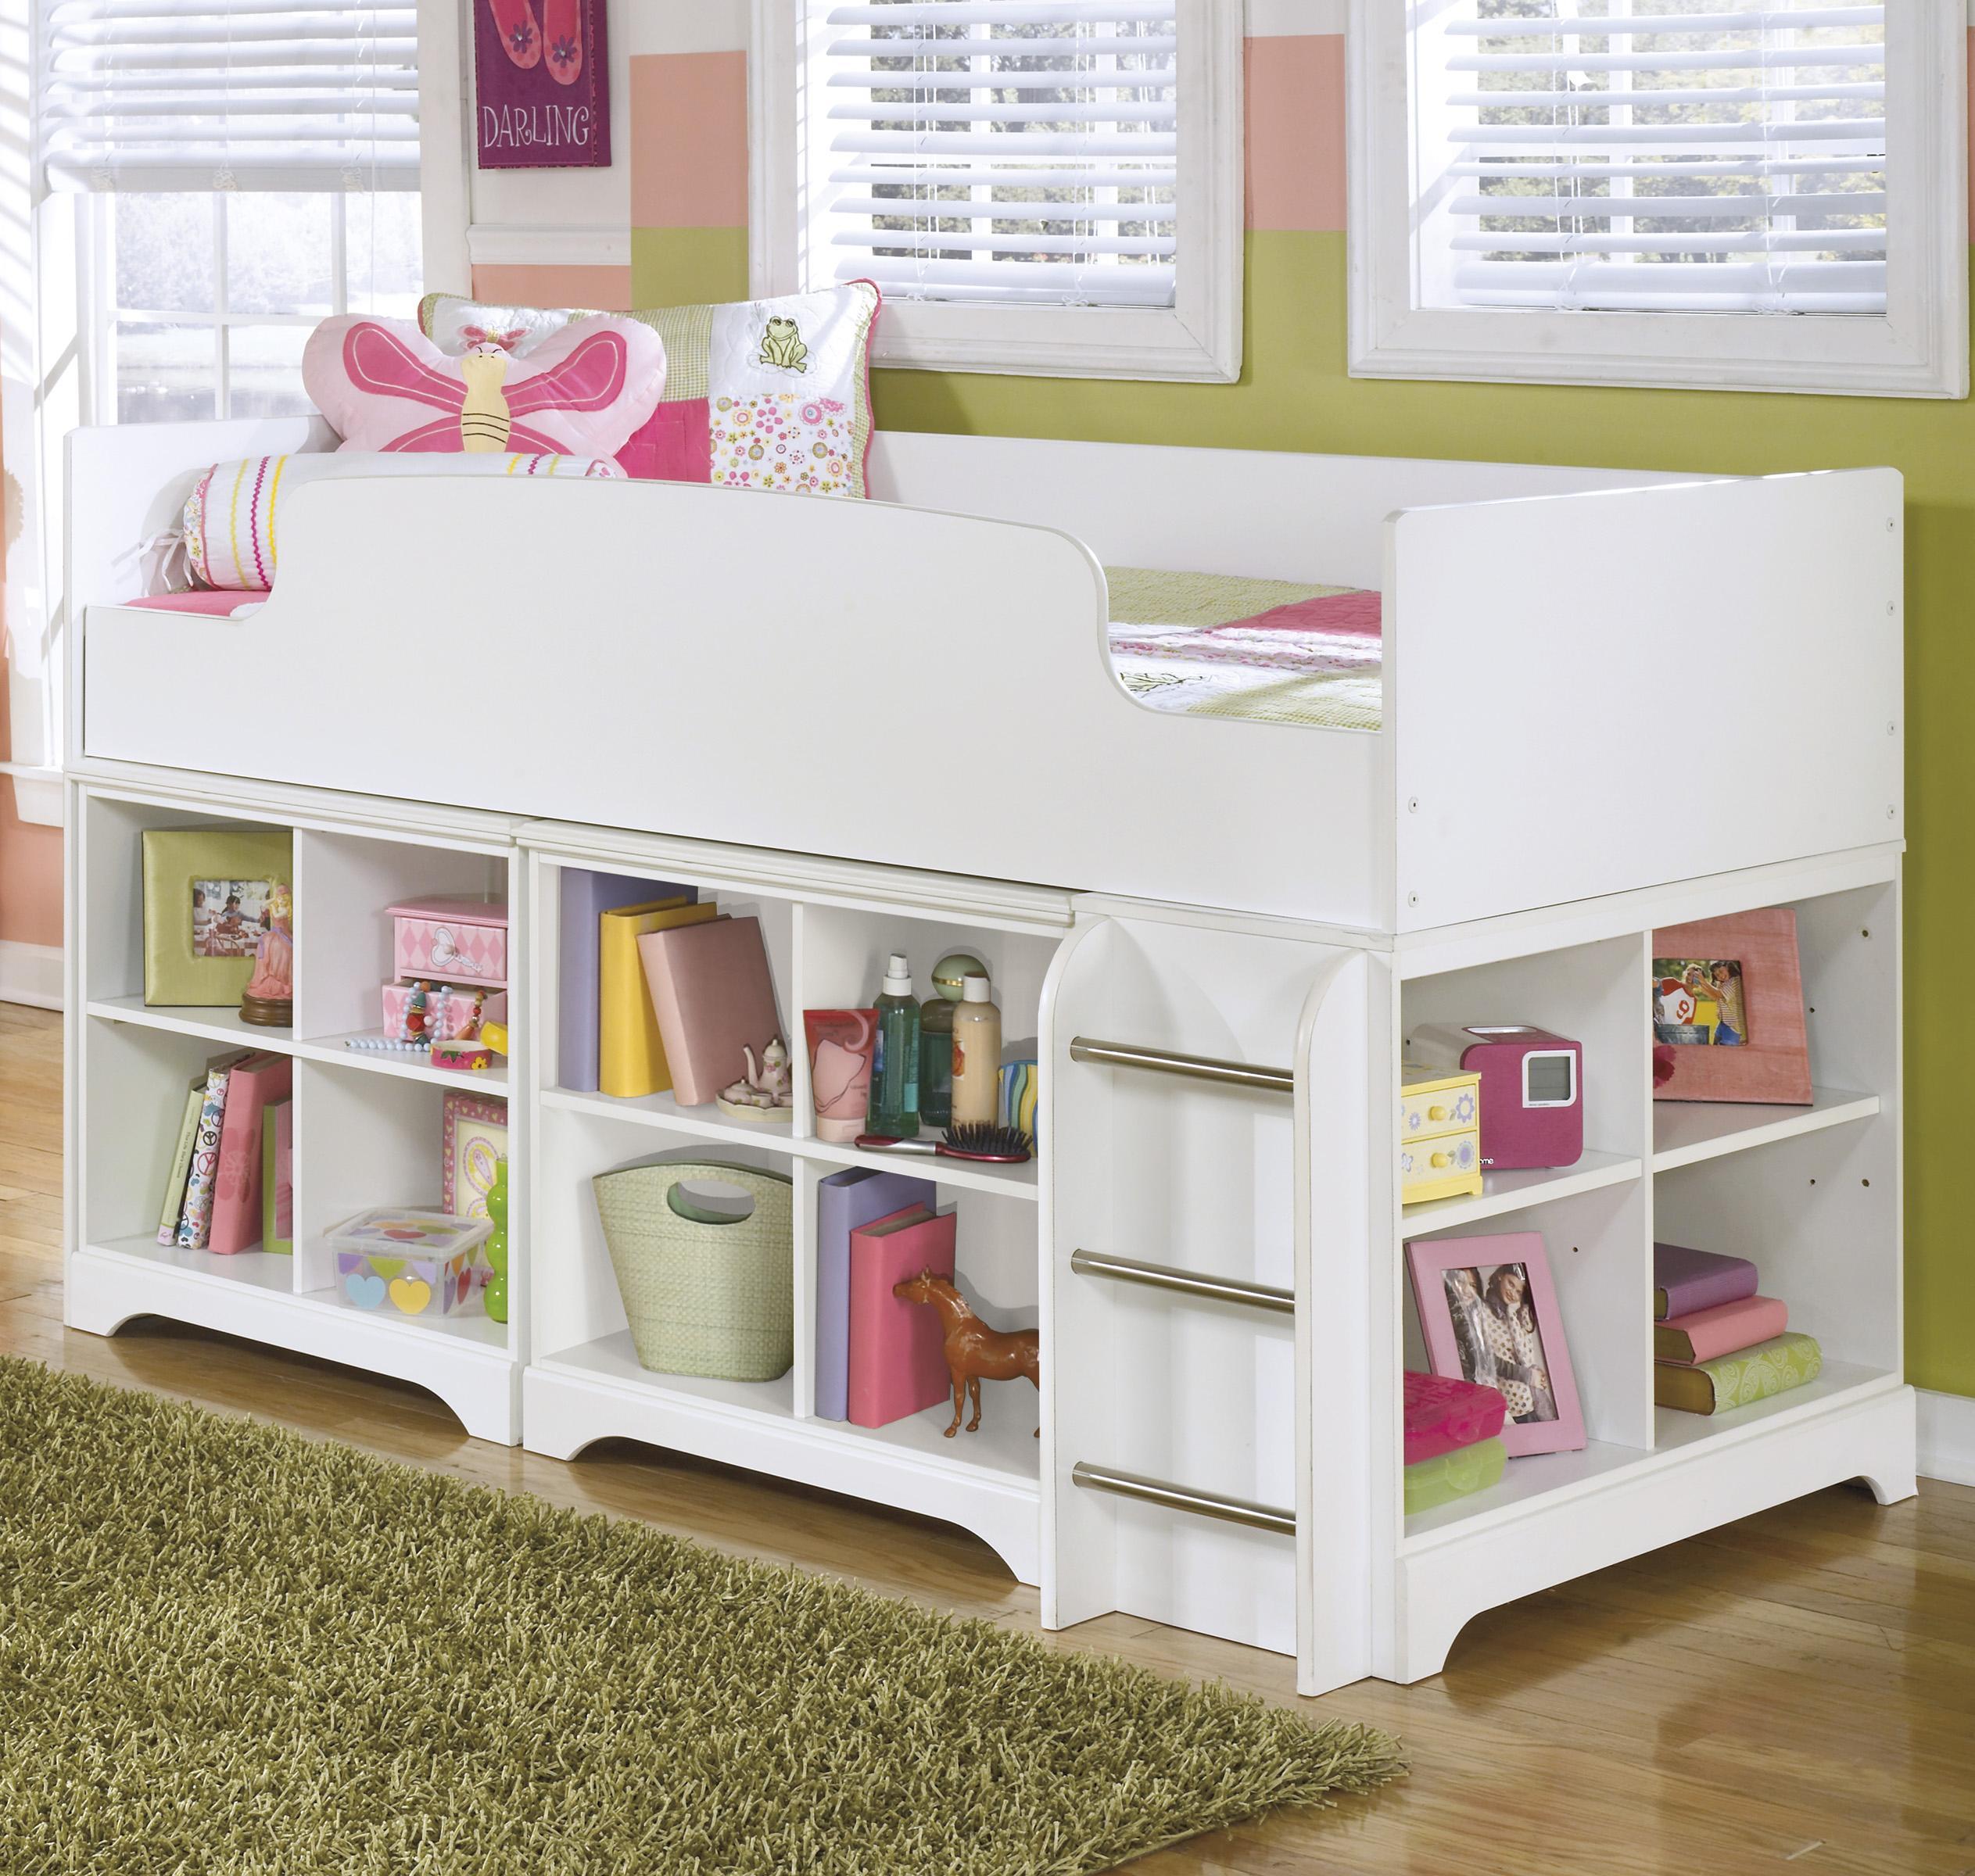 Signature Design By Ashley LuluTwin Loft Bed With Loft Bin Storage ...